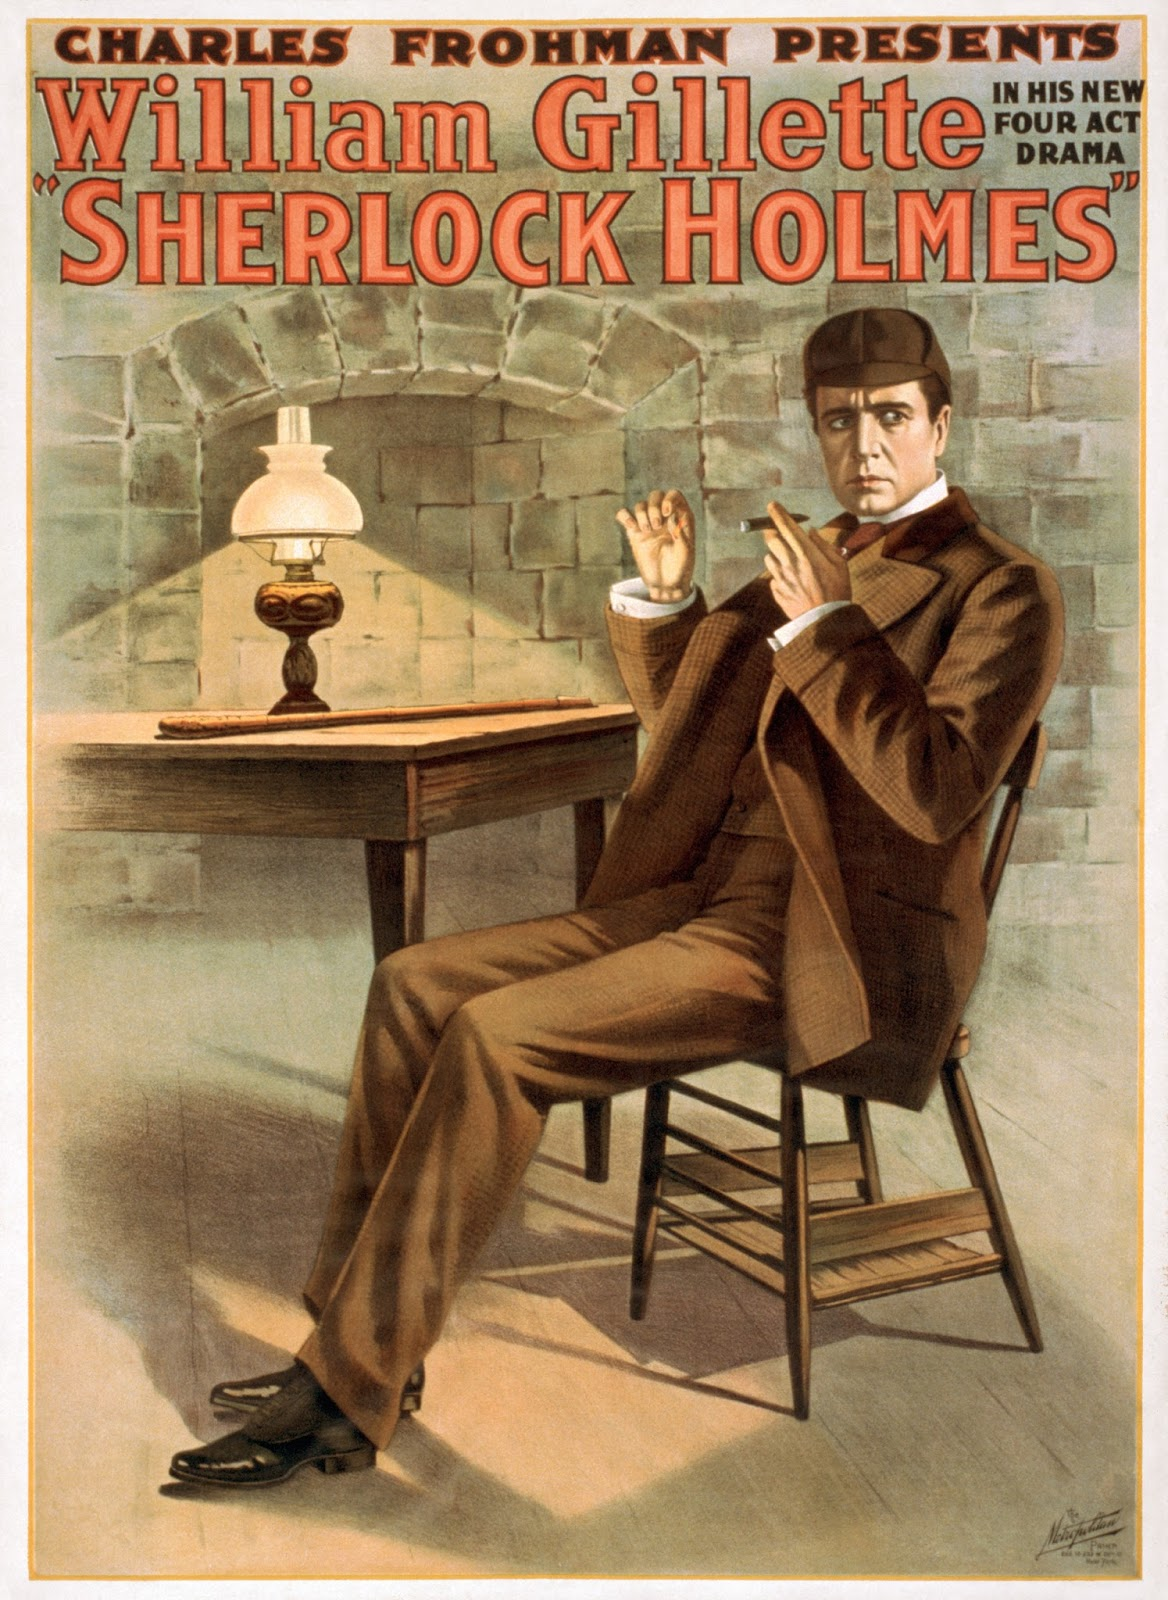 Sherlock Holmes (1916 film) Antti Alanen Film Diary Sherlock Holmes 1916 William Gillette